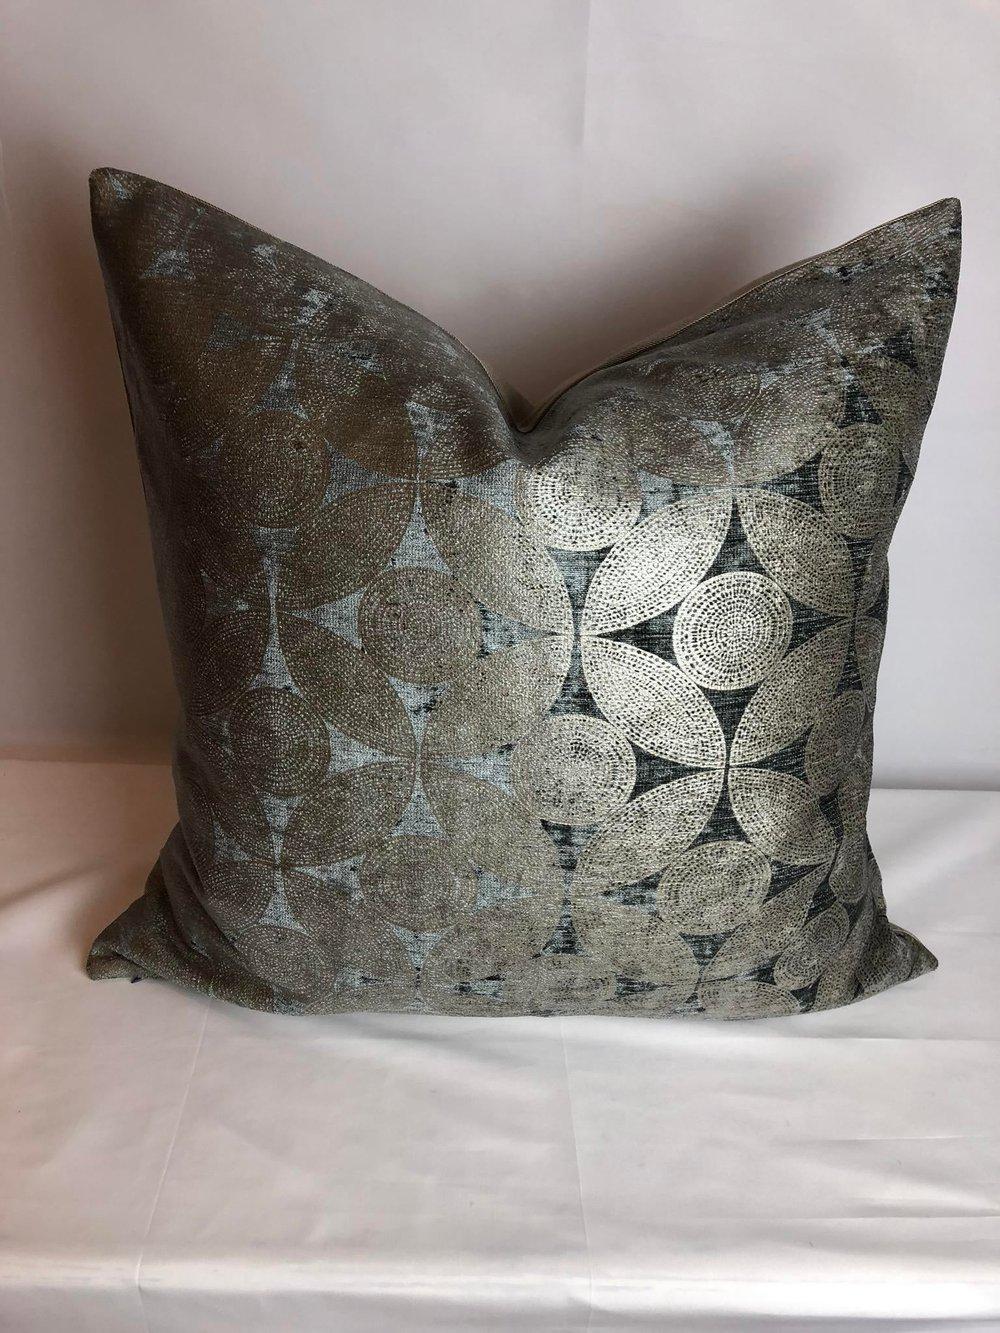 Contemporary Velvet Interlocking Circle Pattern Designer Pillow and 90/10 Down Insert